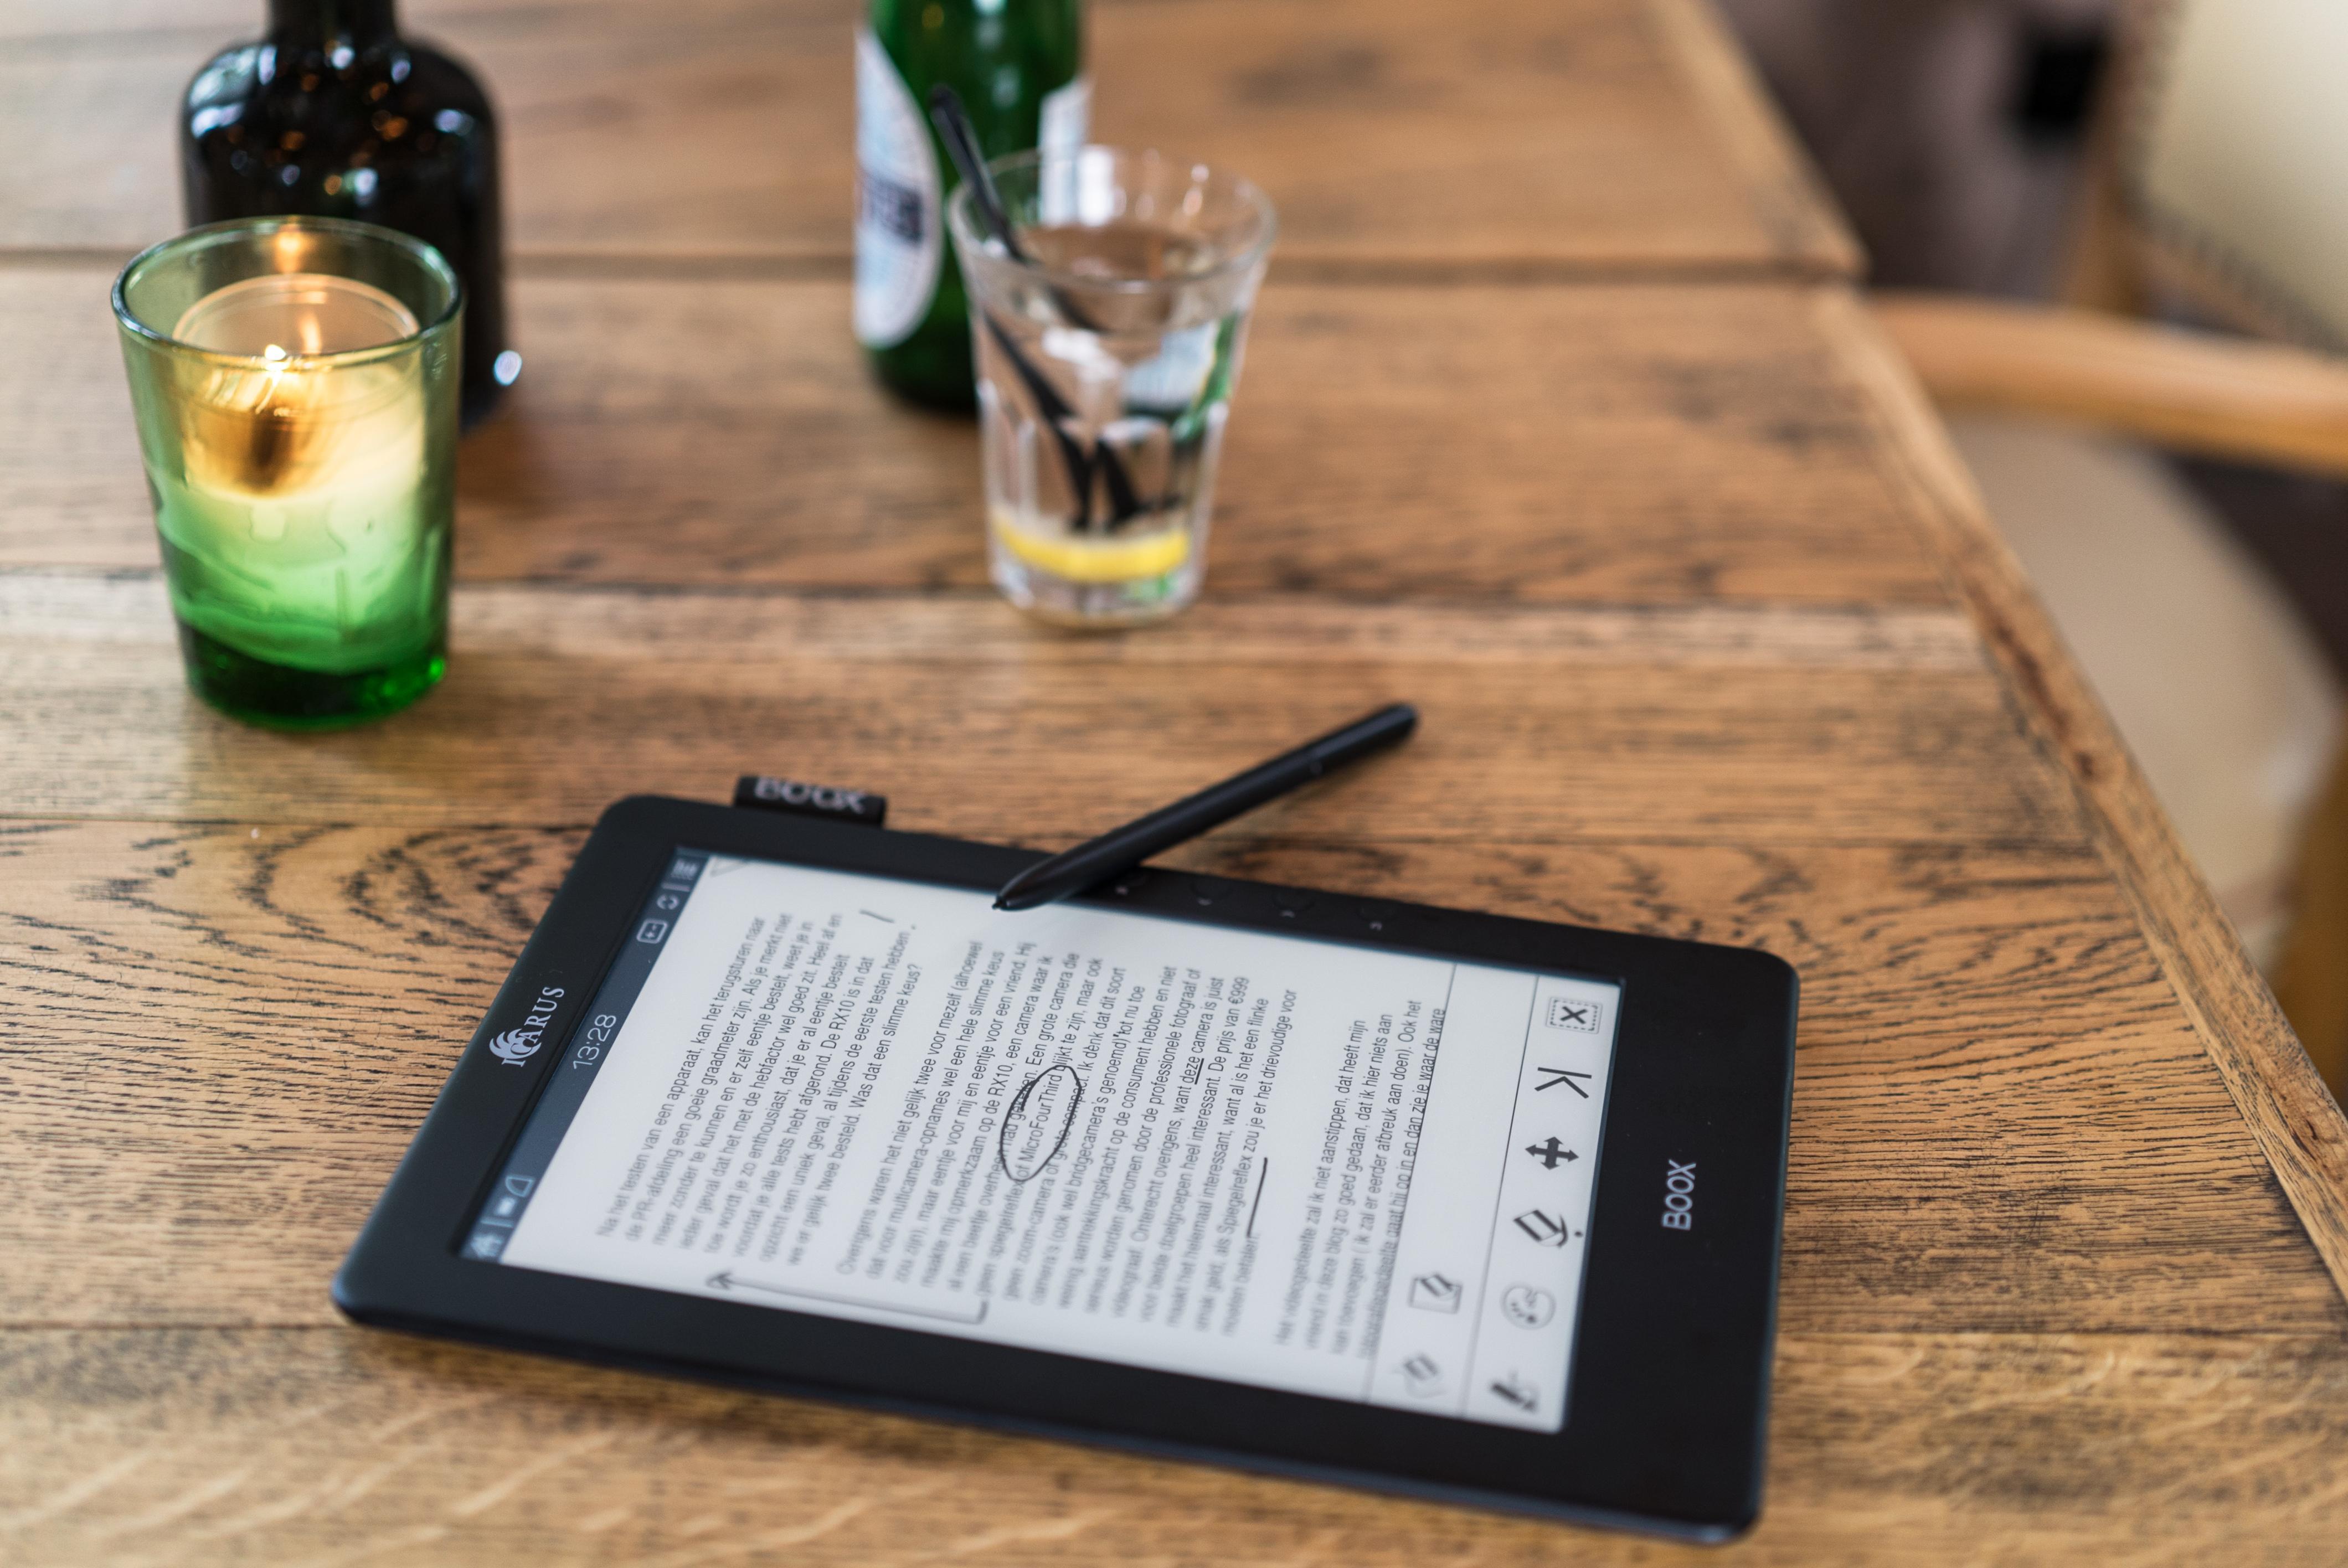 Icarus e-book reader Illumina Pro 9.7 e-reader met verlichting (Wi ...